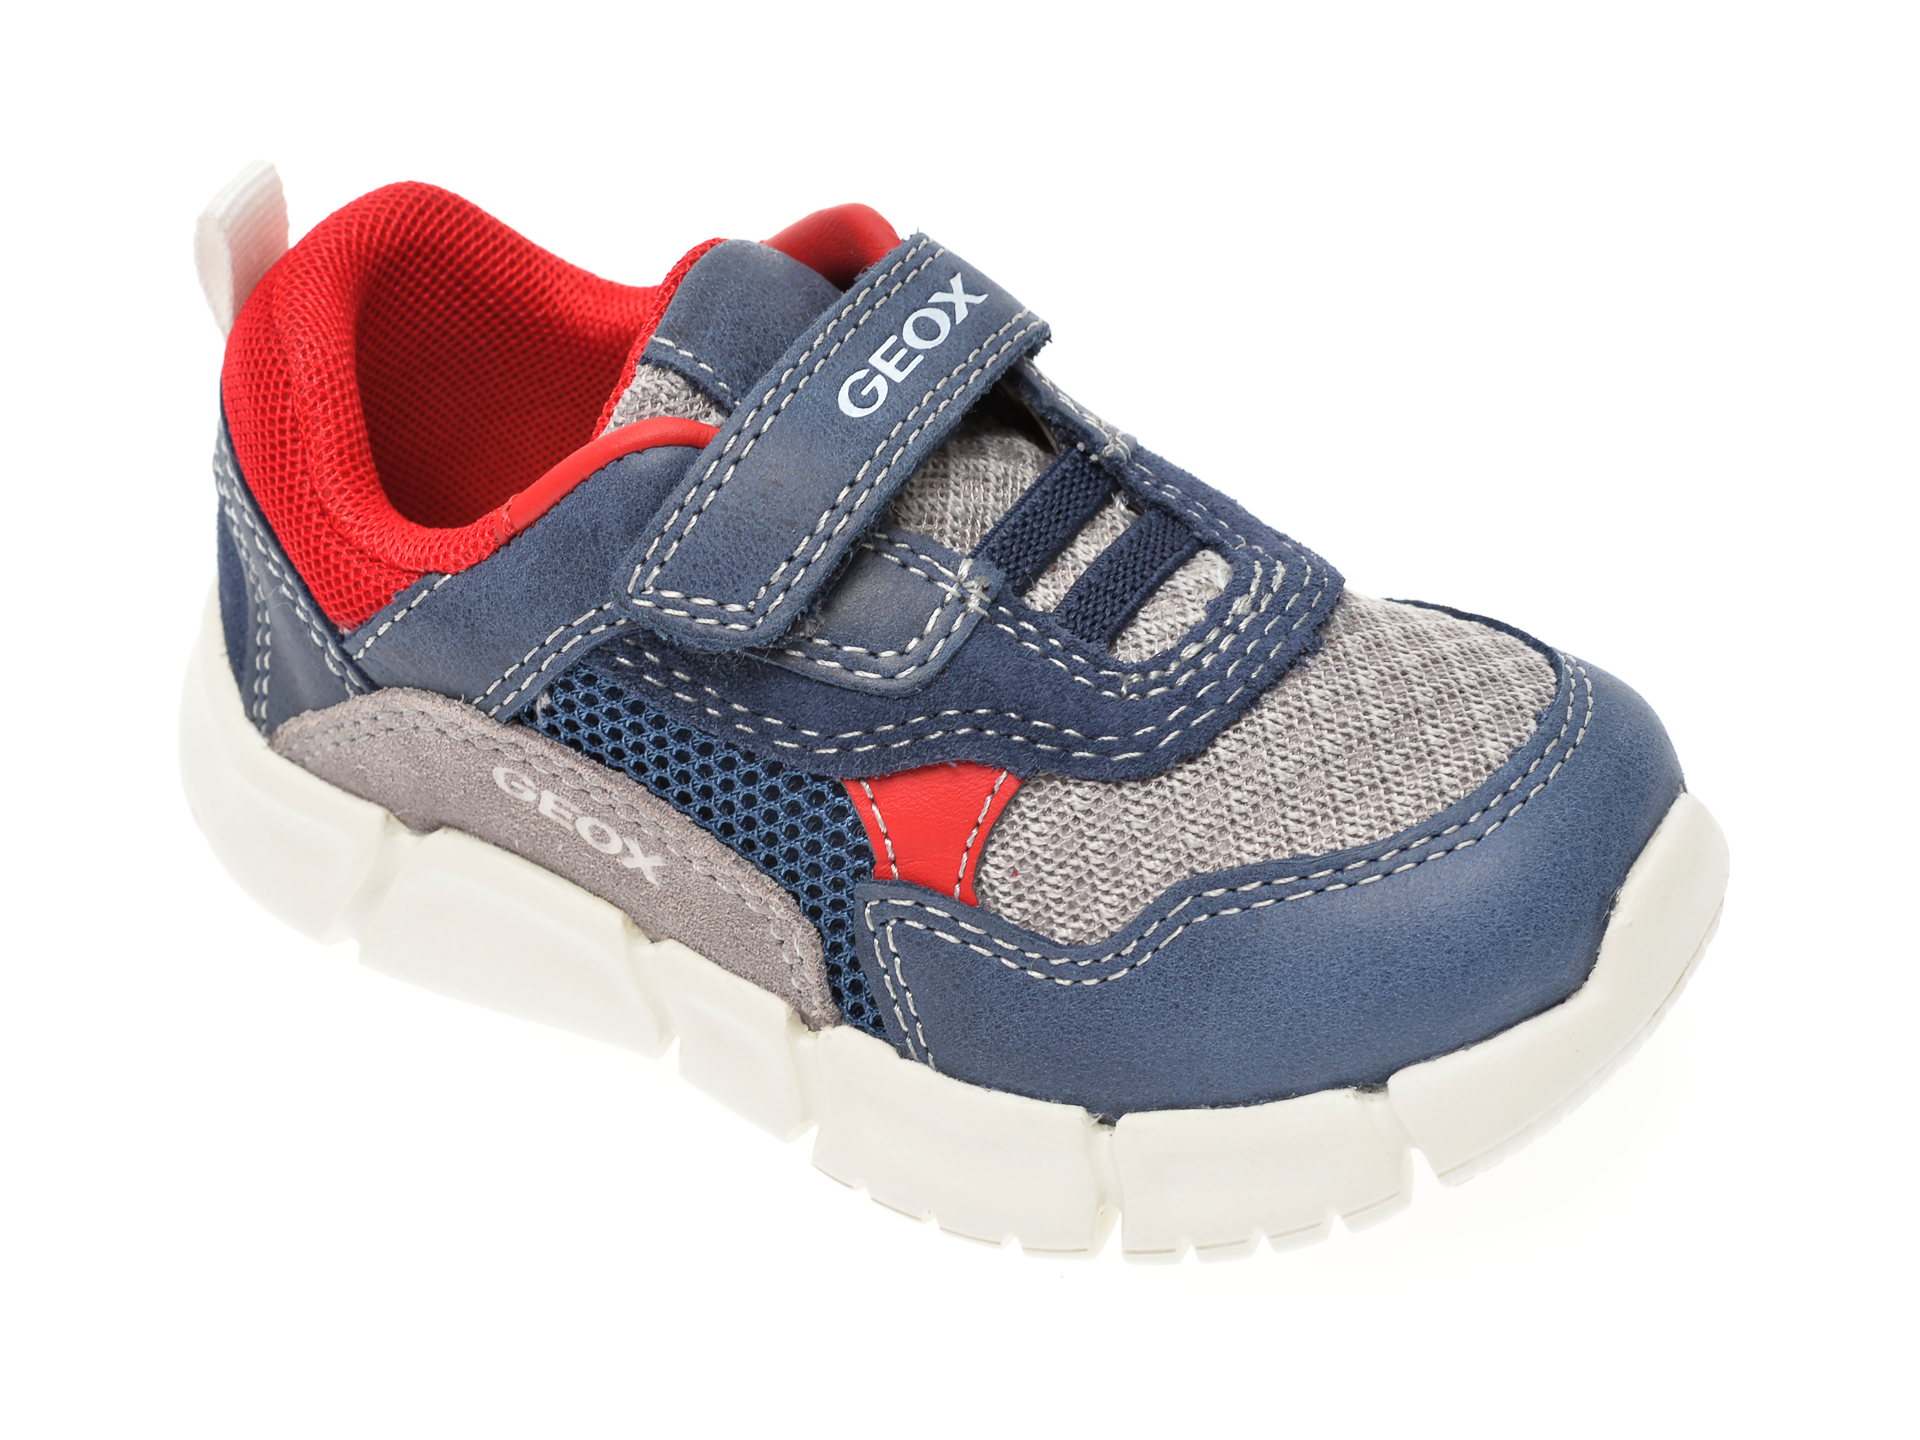 Pantofi sport GEOX bleumarin, B022TA, din material textil si piele naturala New